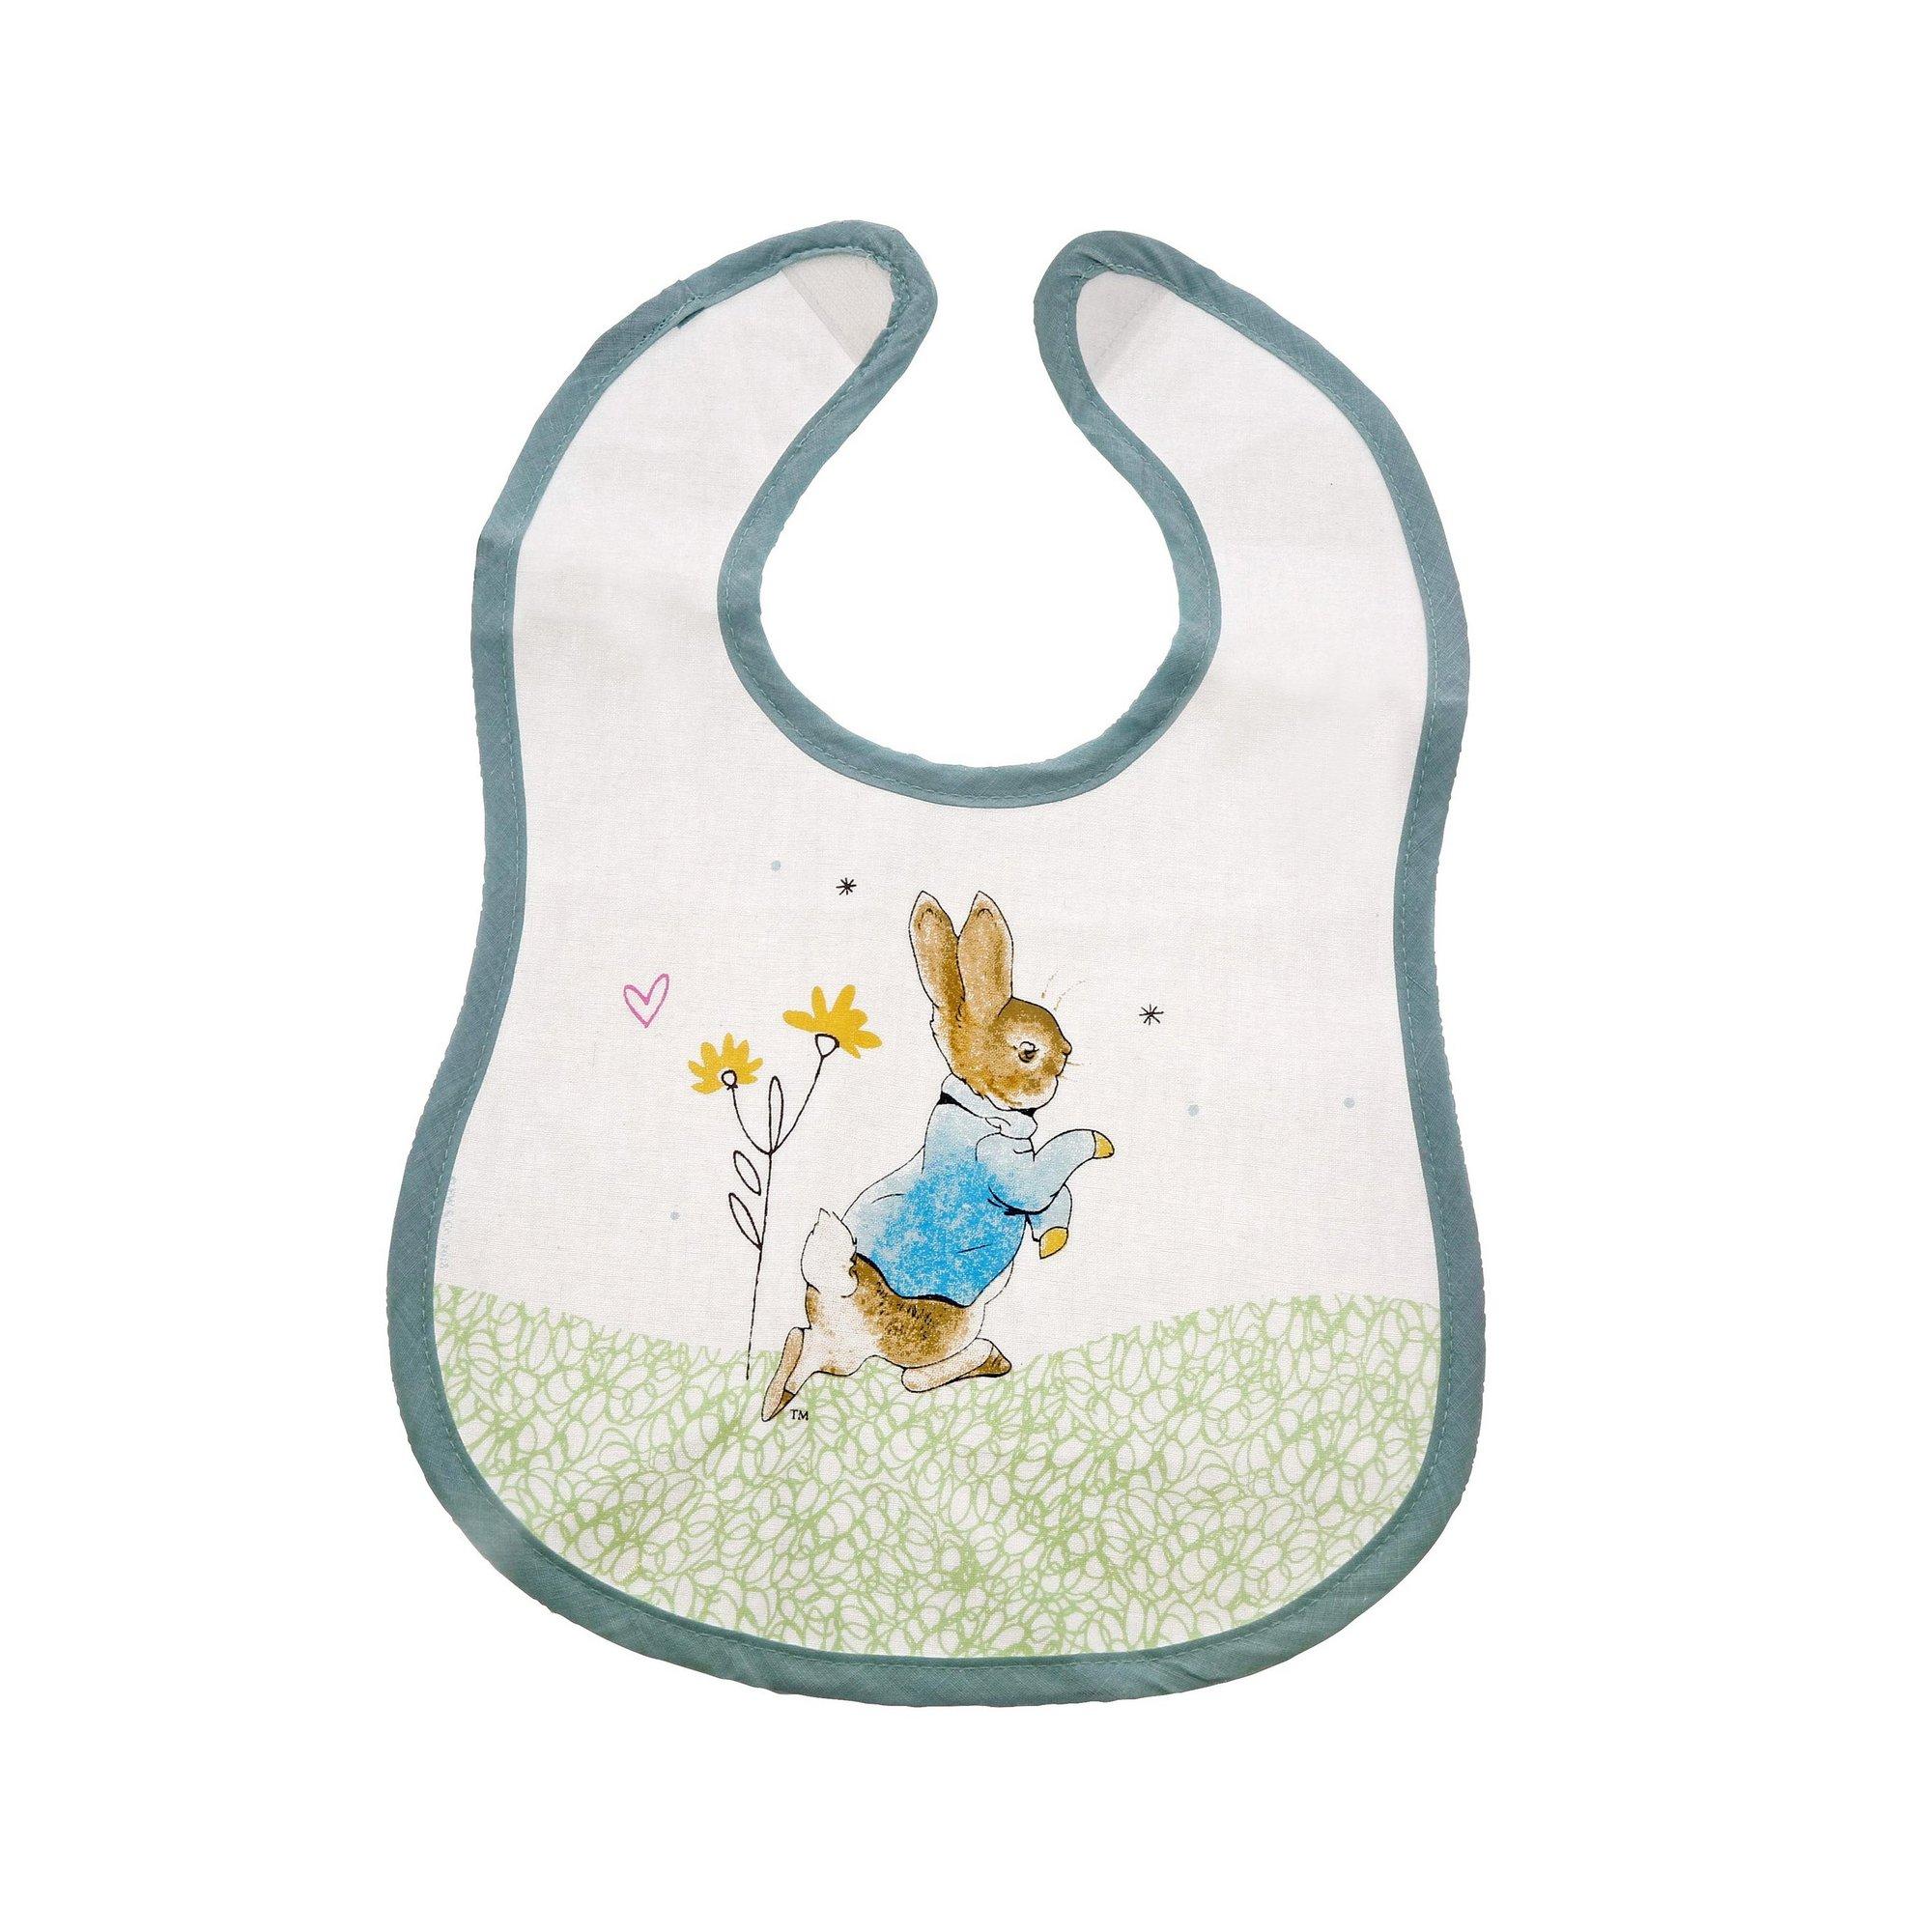 Image of Beatrix Potter Peter Rabbit Bib